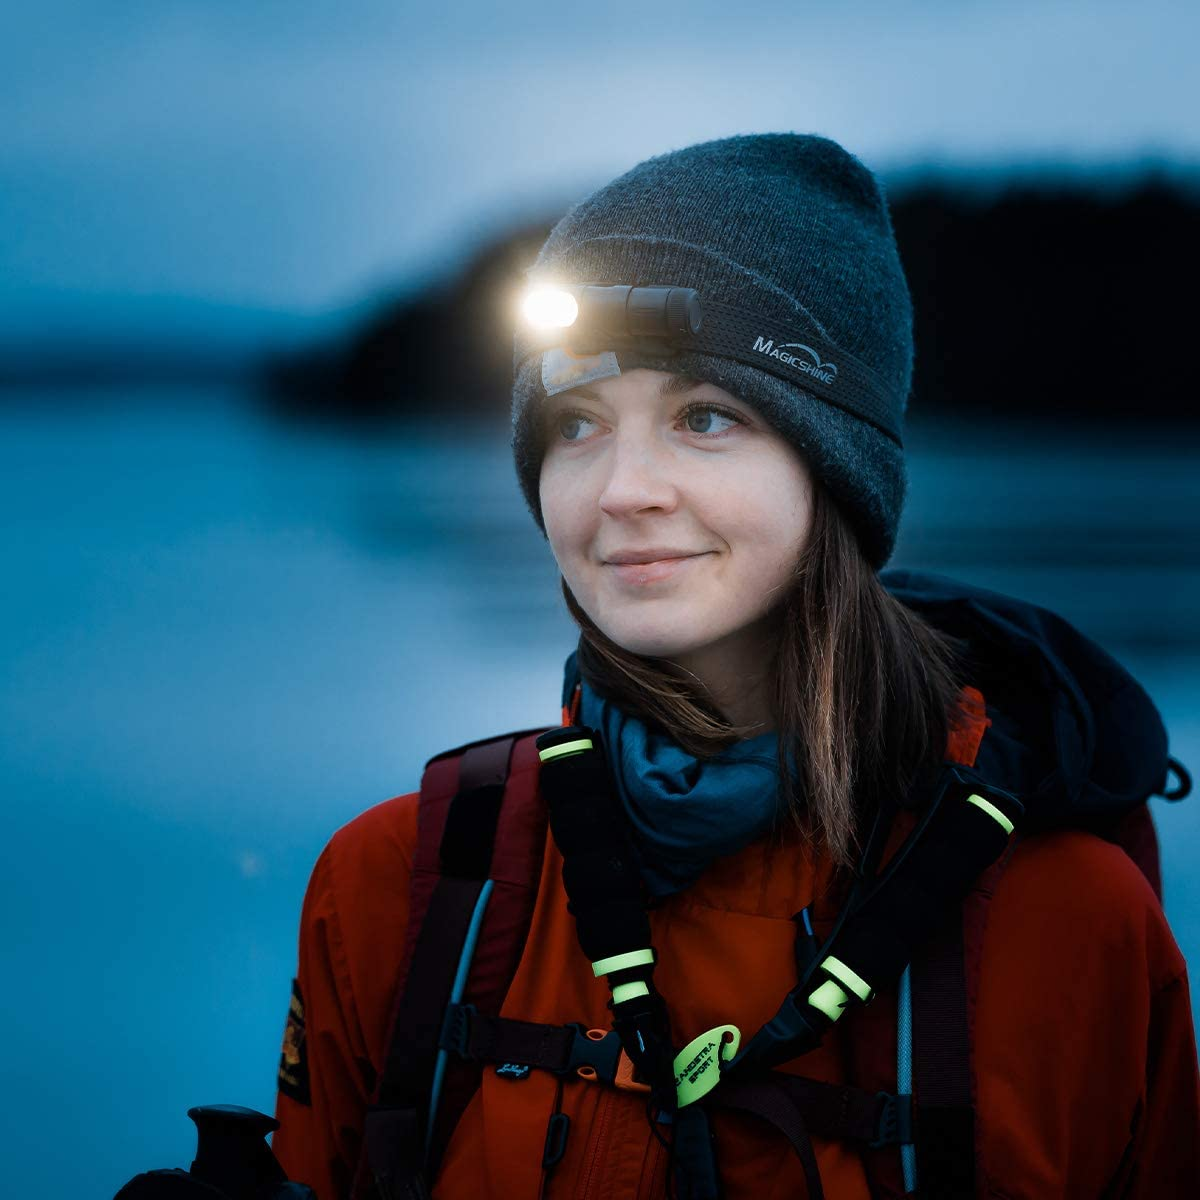 IPX8 Waterproof headlamp 400 Lumen Neutral White Light CRI 90 Work Light Lightweight for Running bushcraft 105 Lumen red LED Magicshine MOH 15 Headlamp Hiking Camping Outdoor Sports